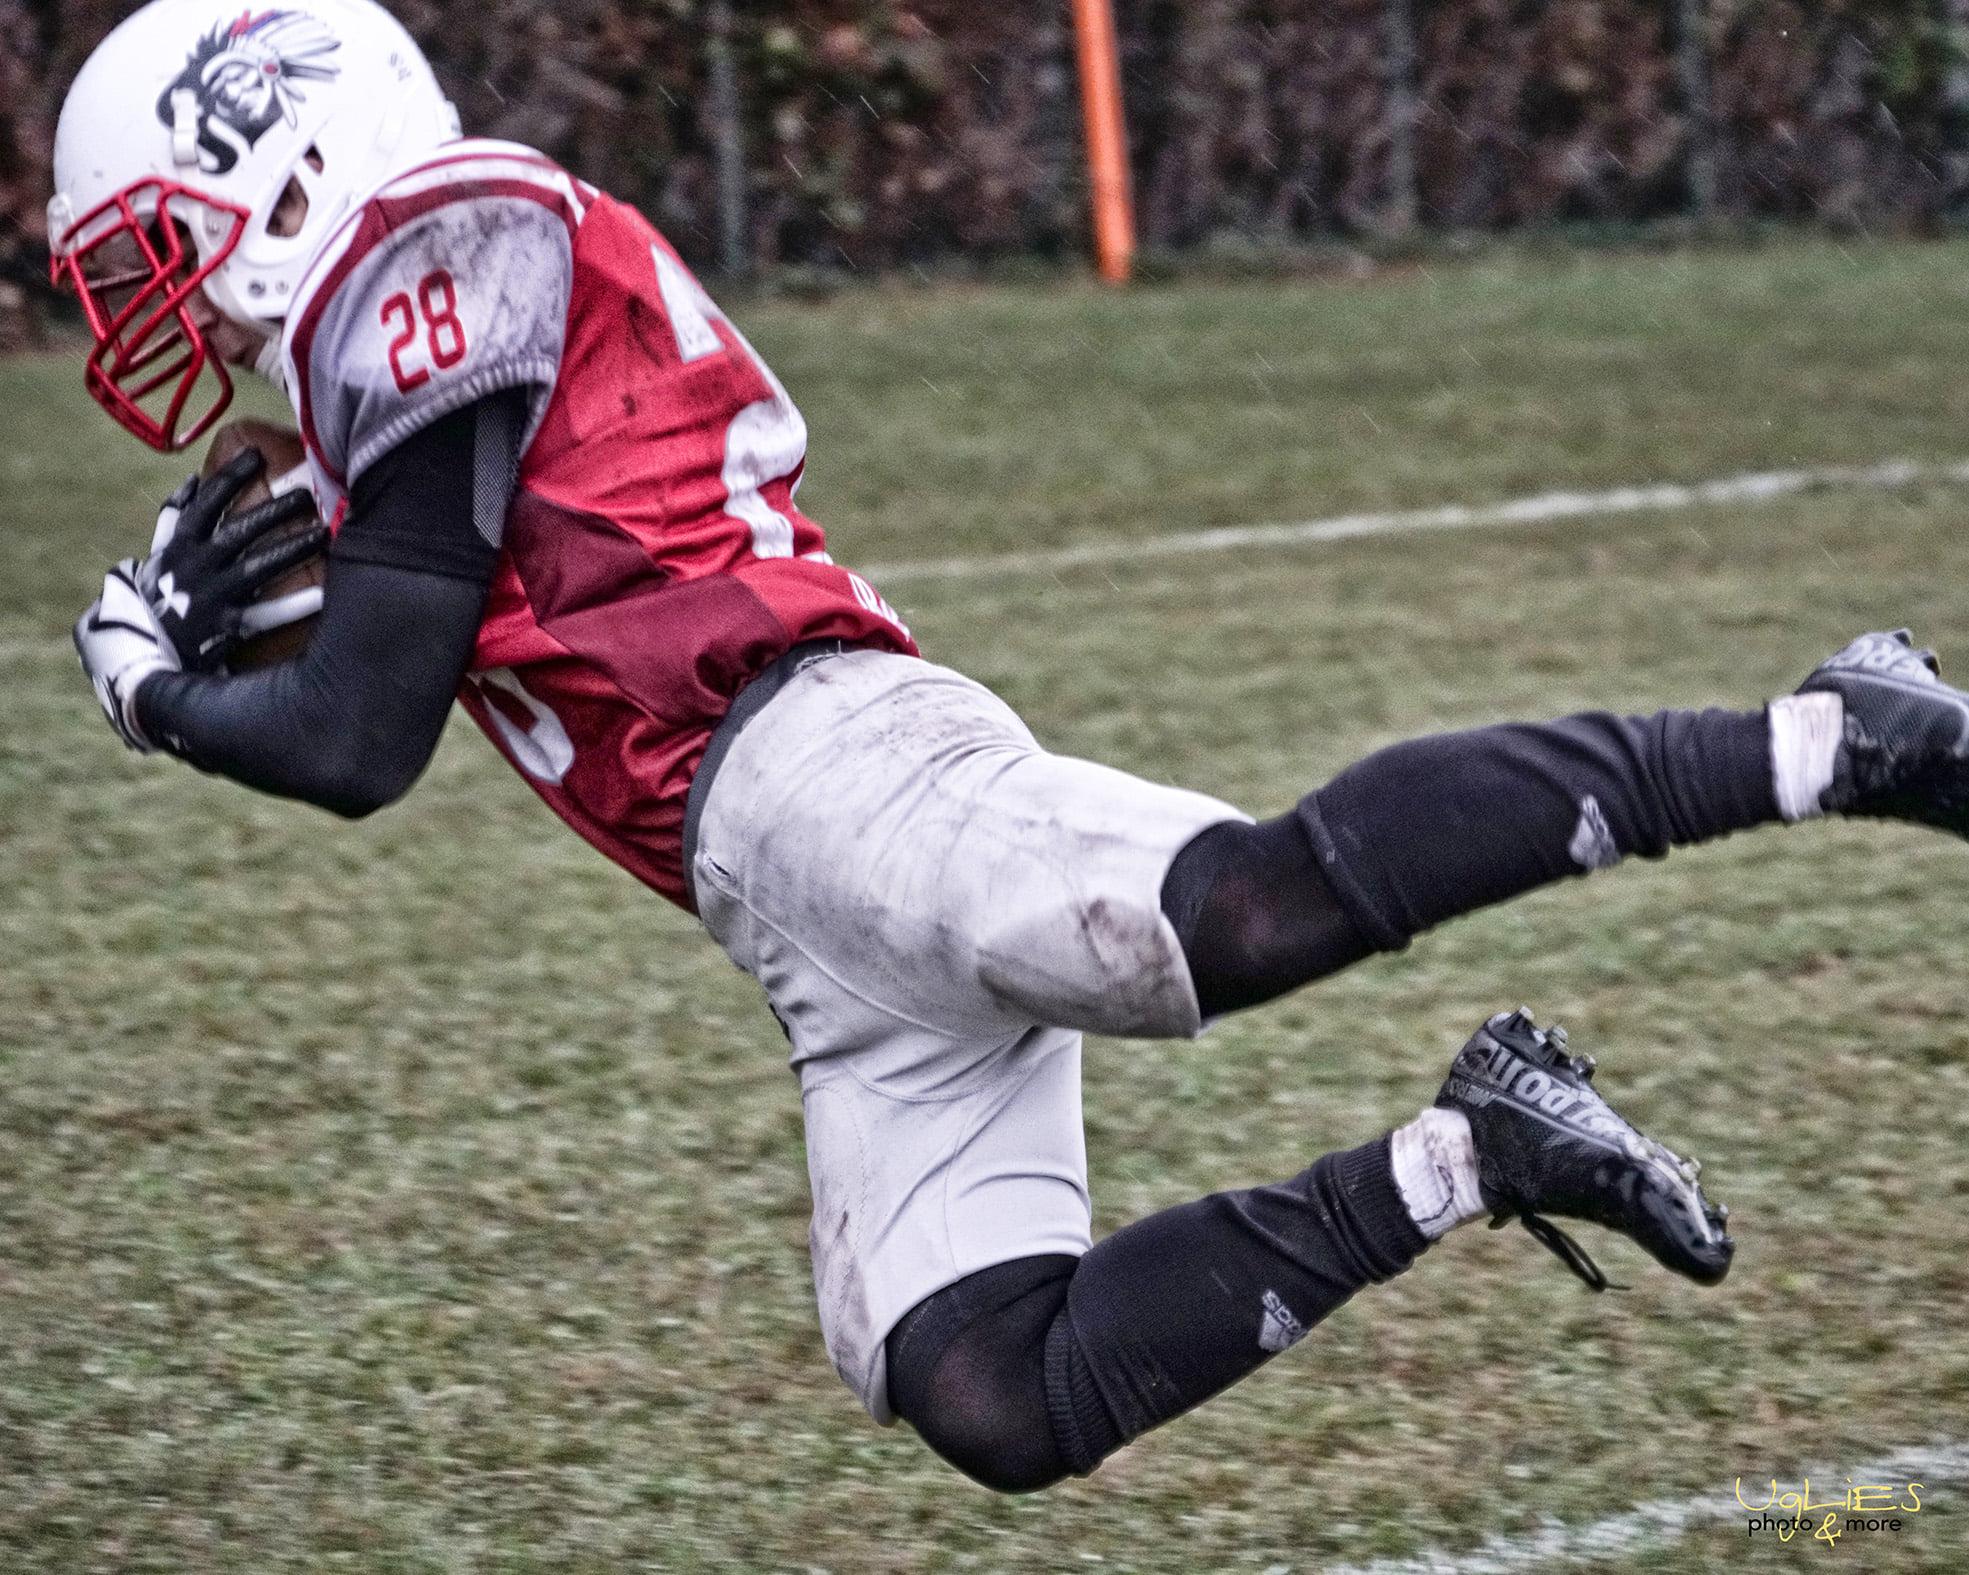 touchdown foto paolo brutti